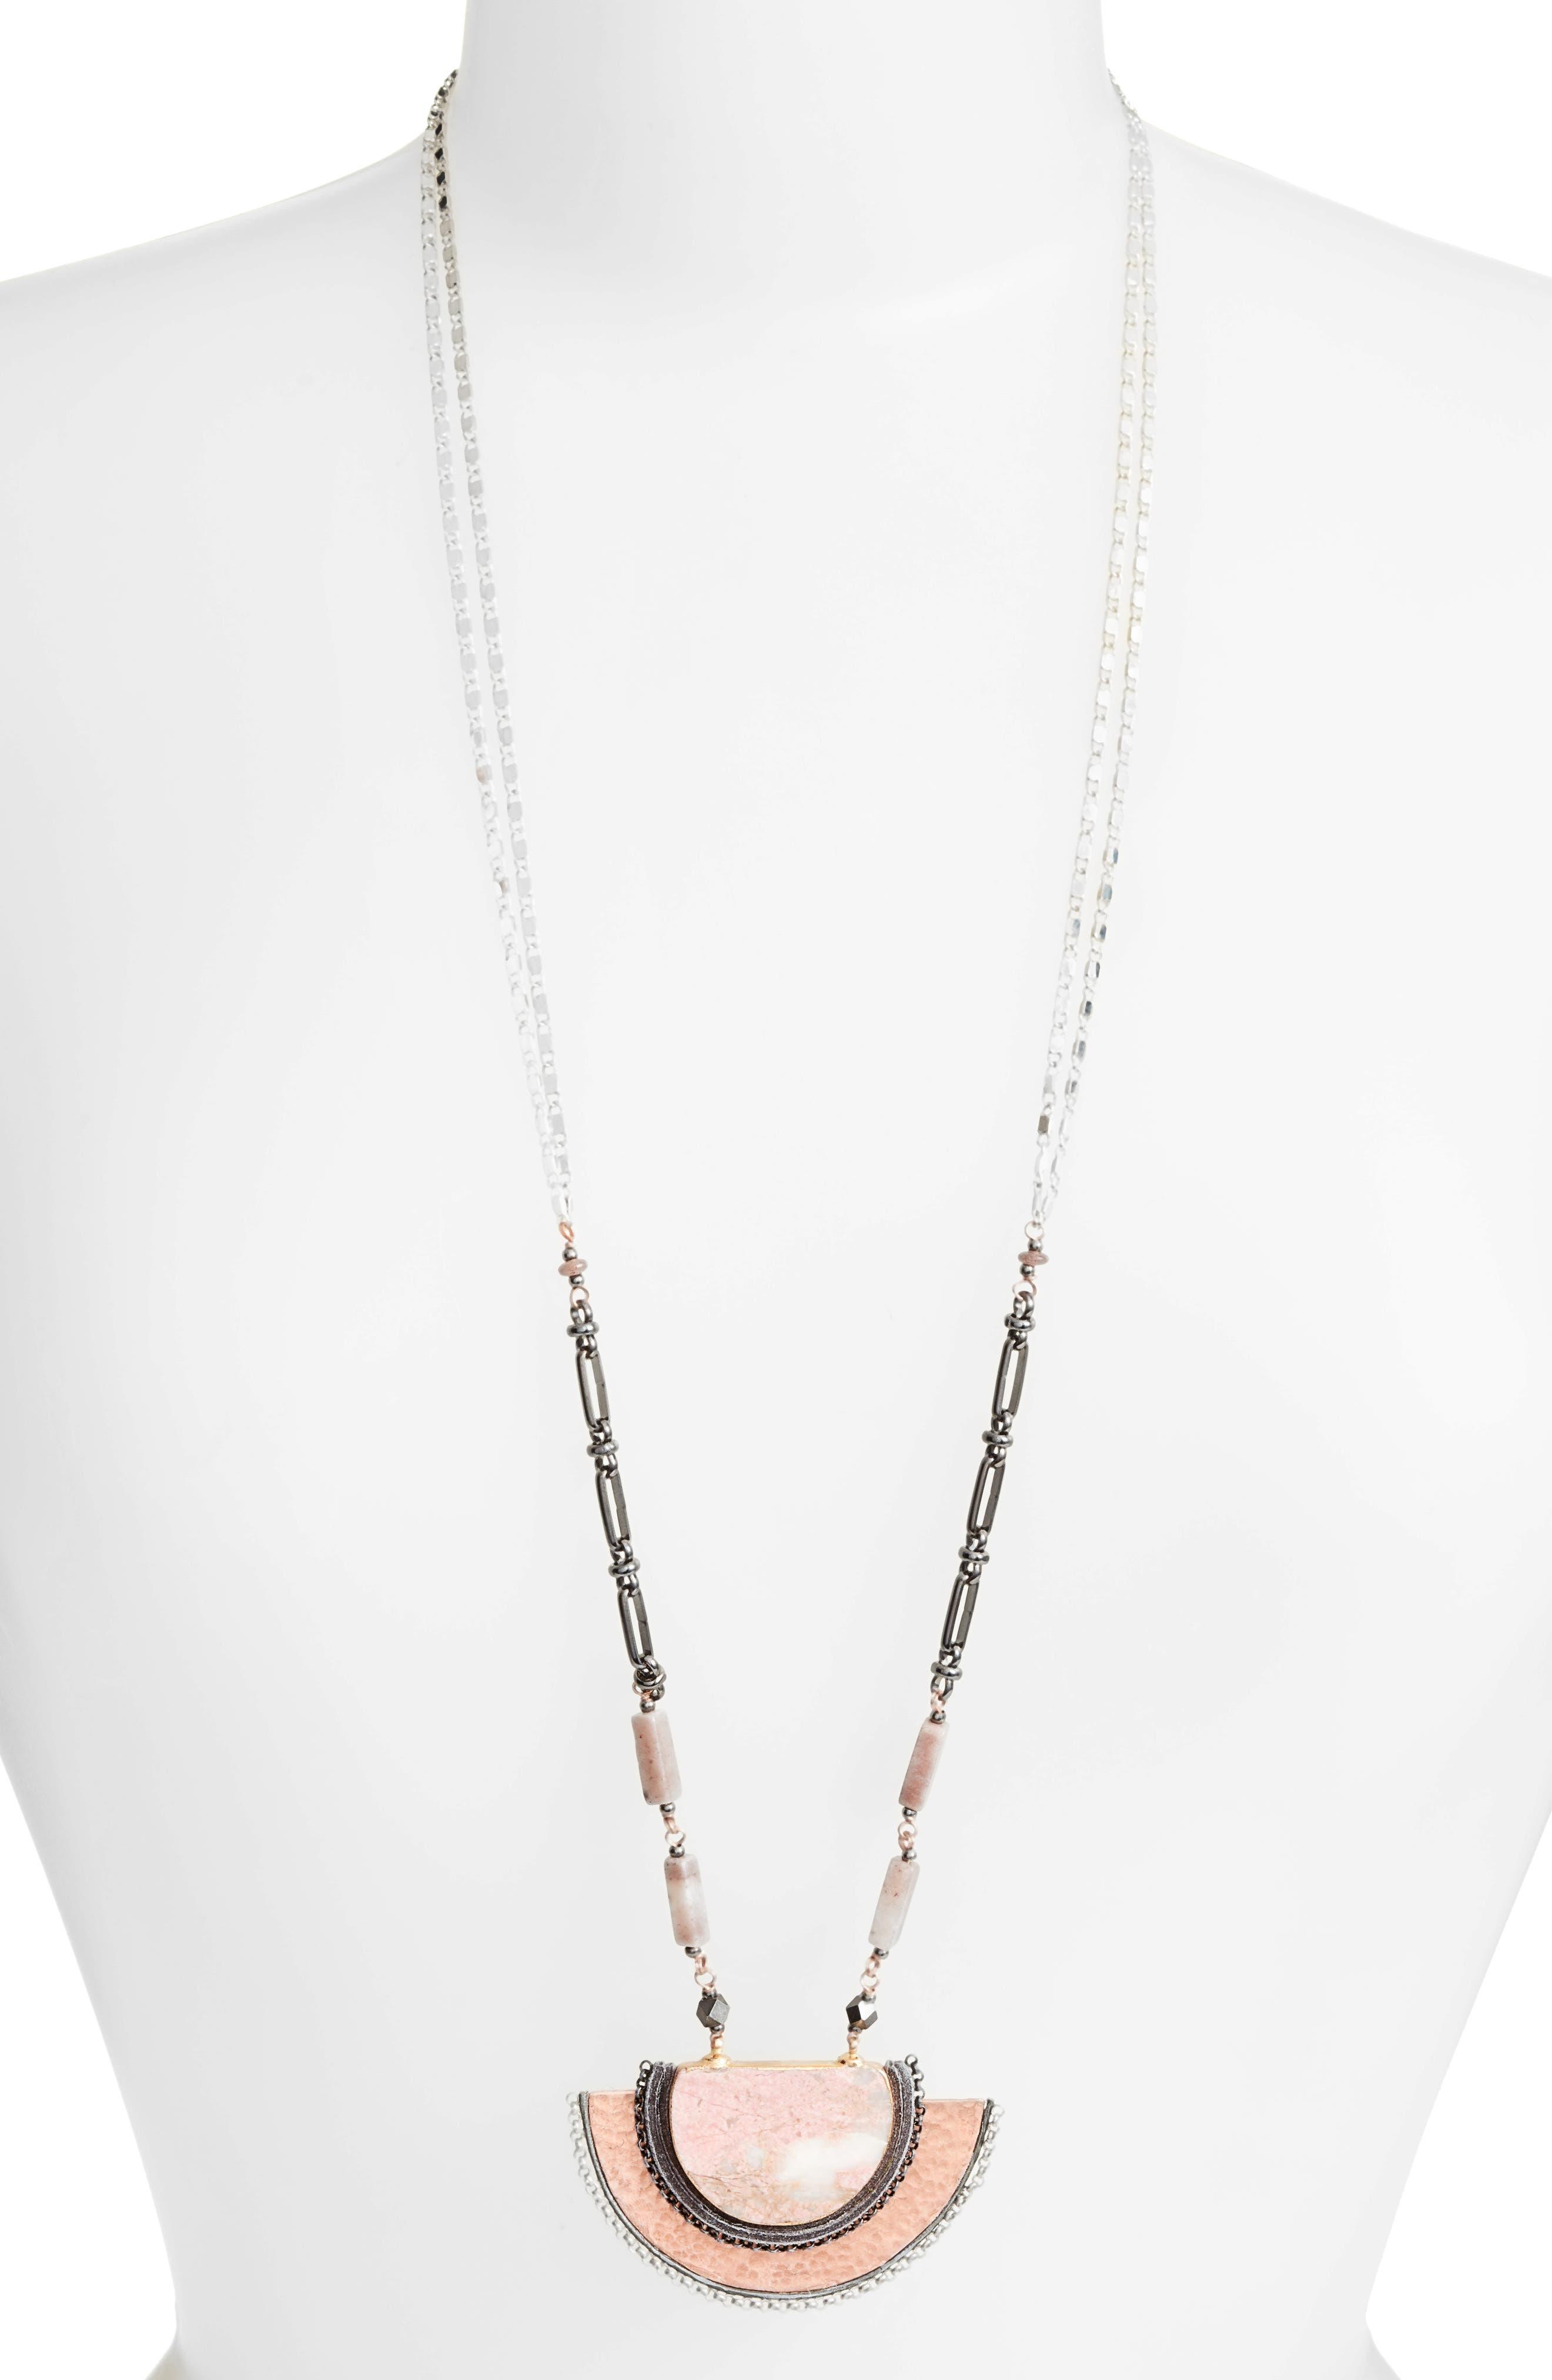 Main Image - Nakamol Design Half Moon Stone Pendant Necklace